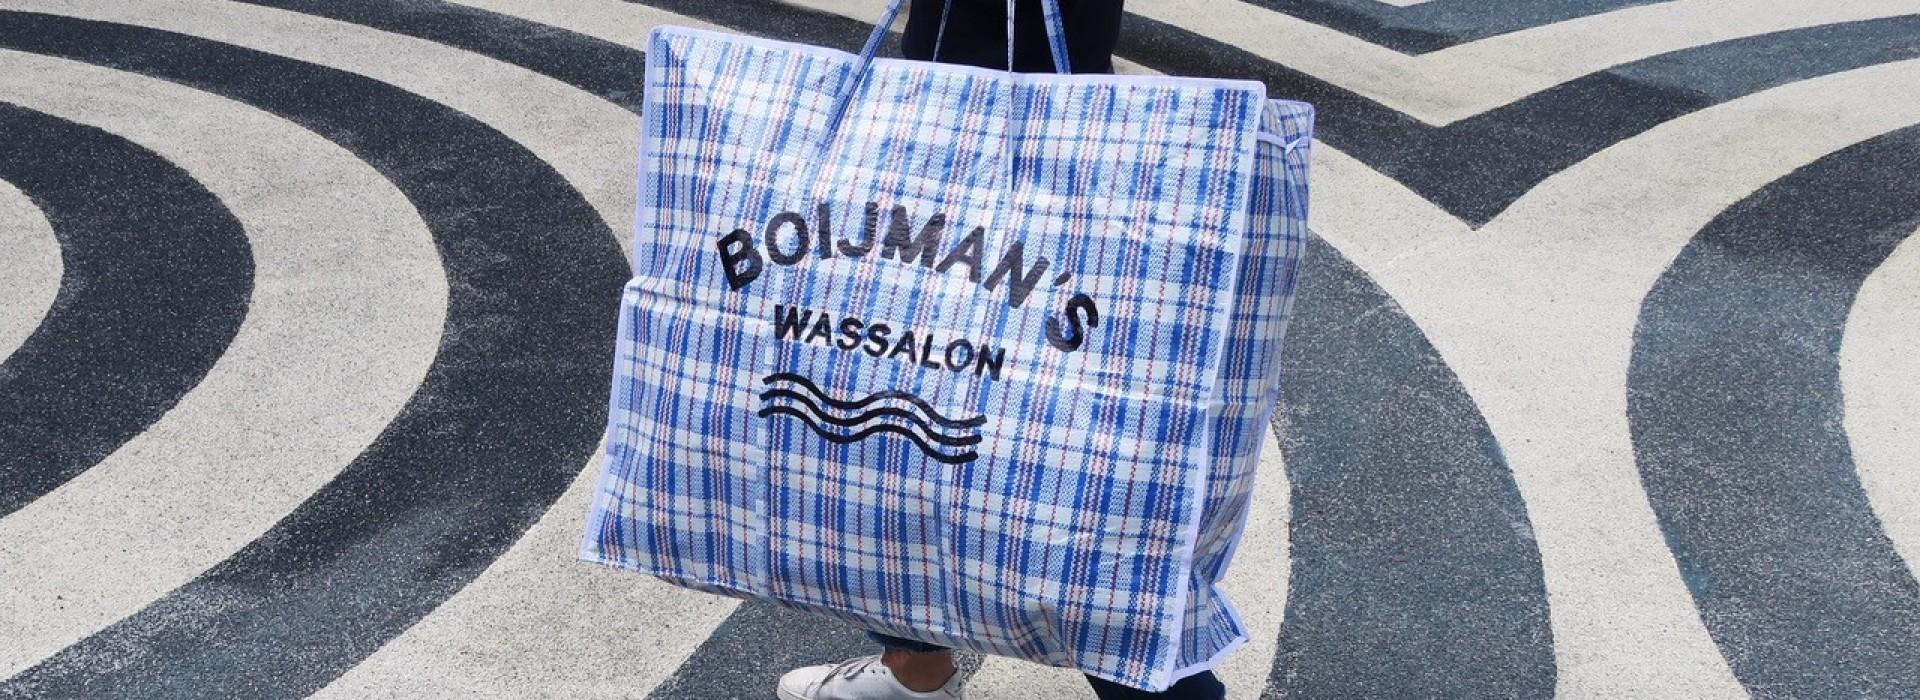 Boijmans Wassalon - Manon Van Hoeckel 0TenJ9lXxRkQkP0tojugrwzSqSkAzghw34t1T7To